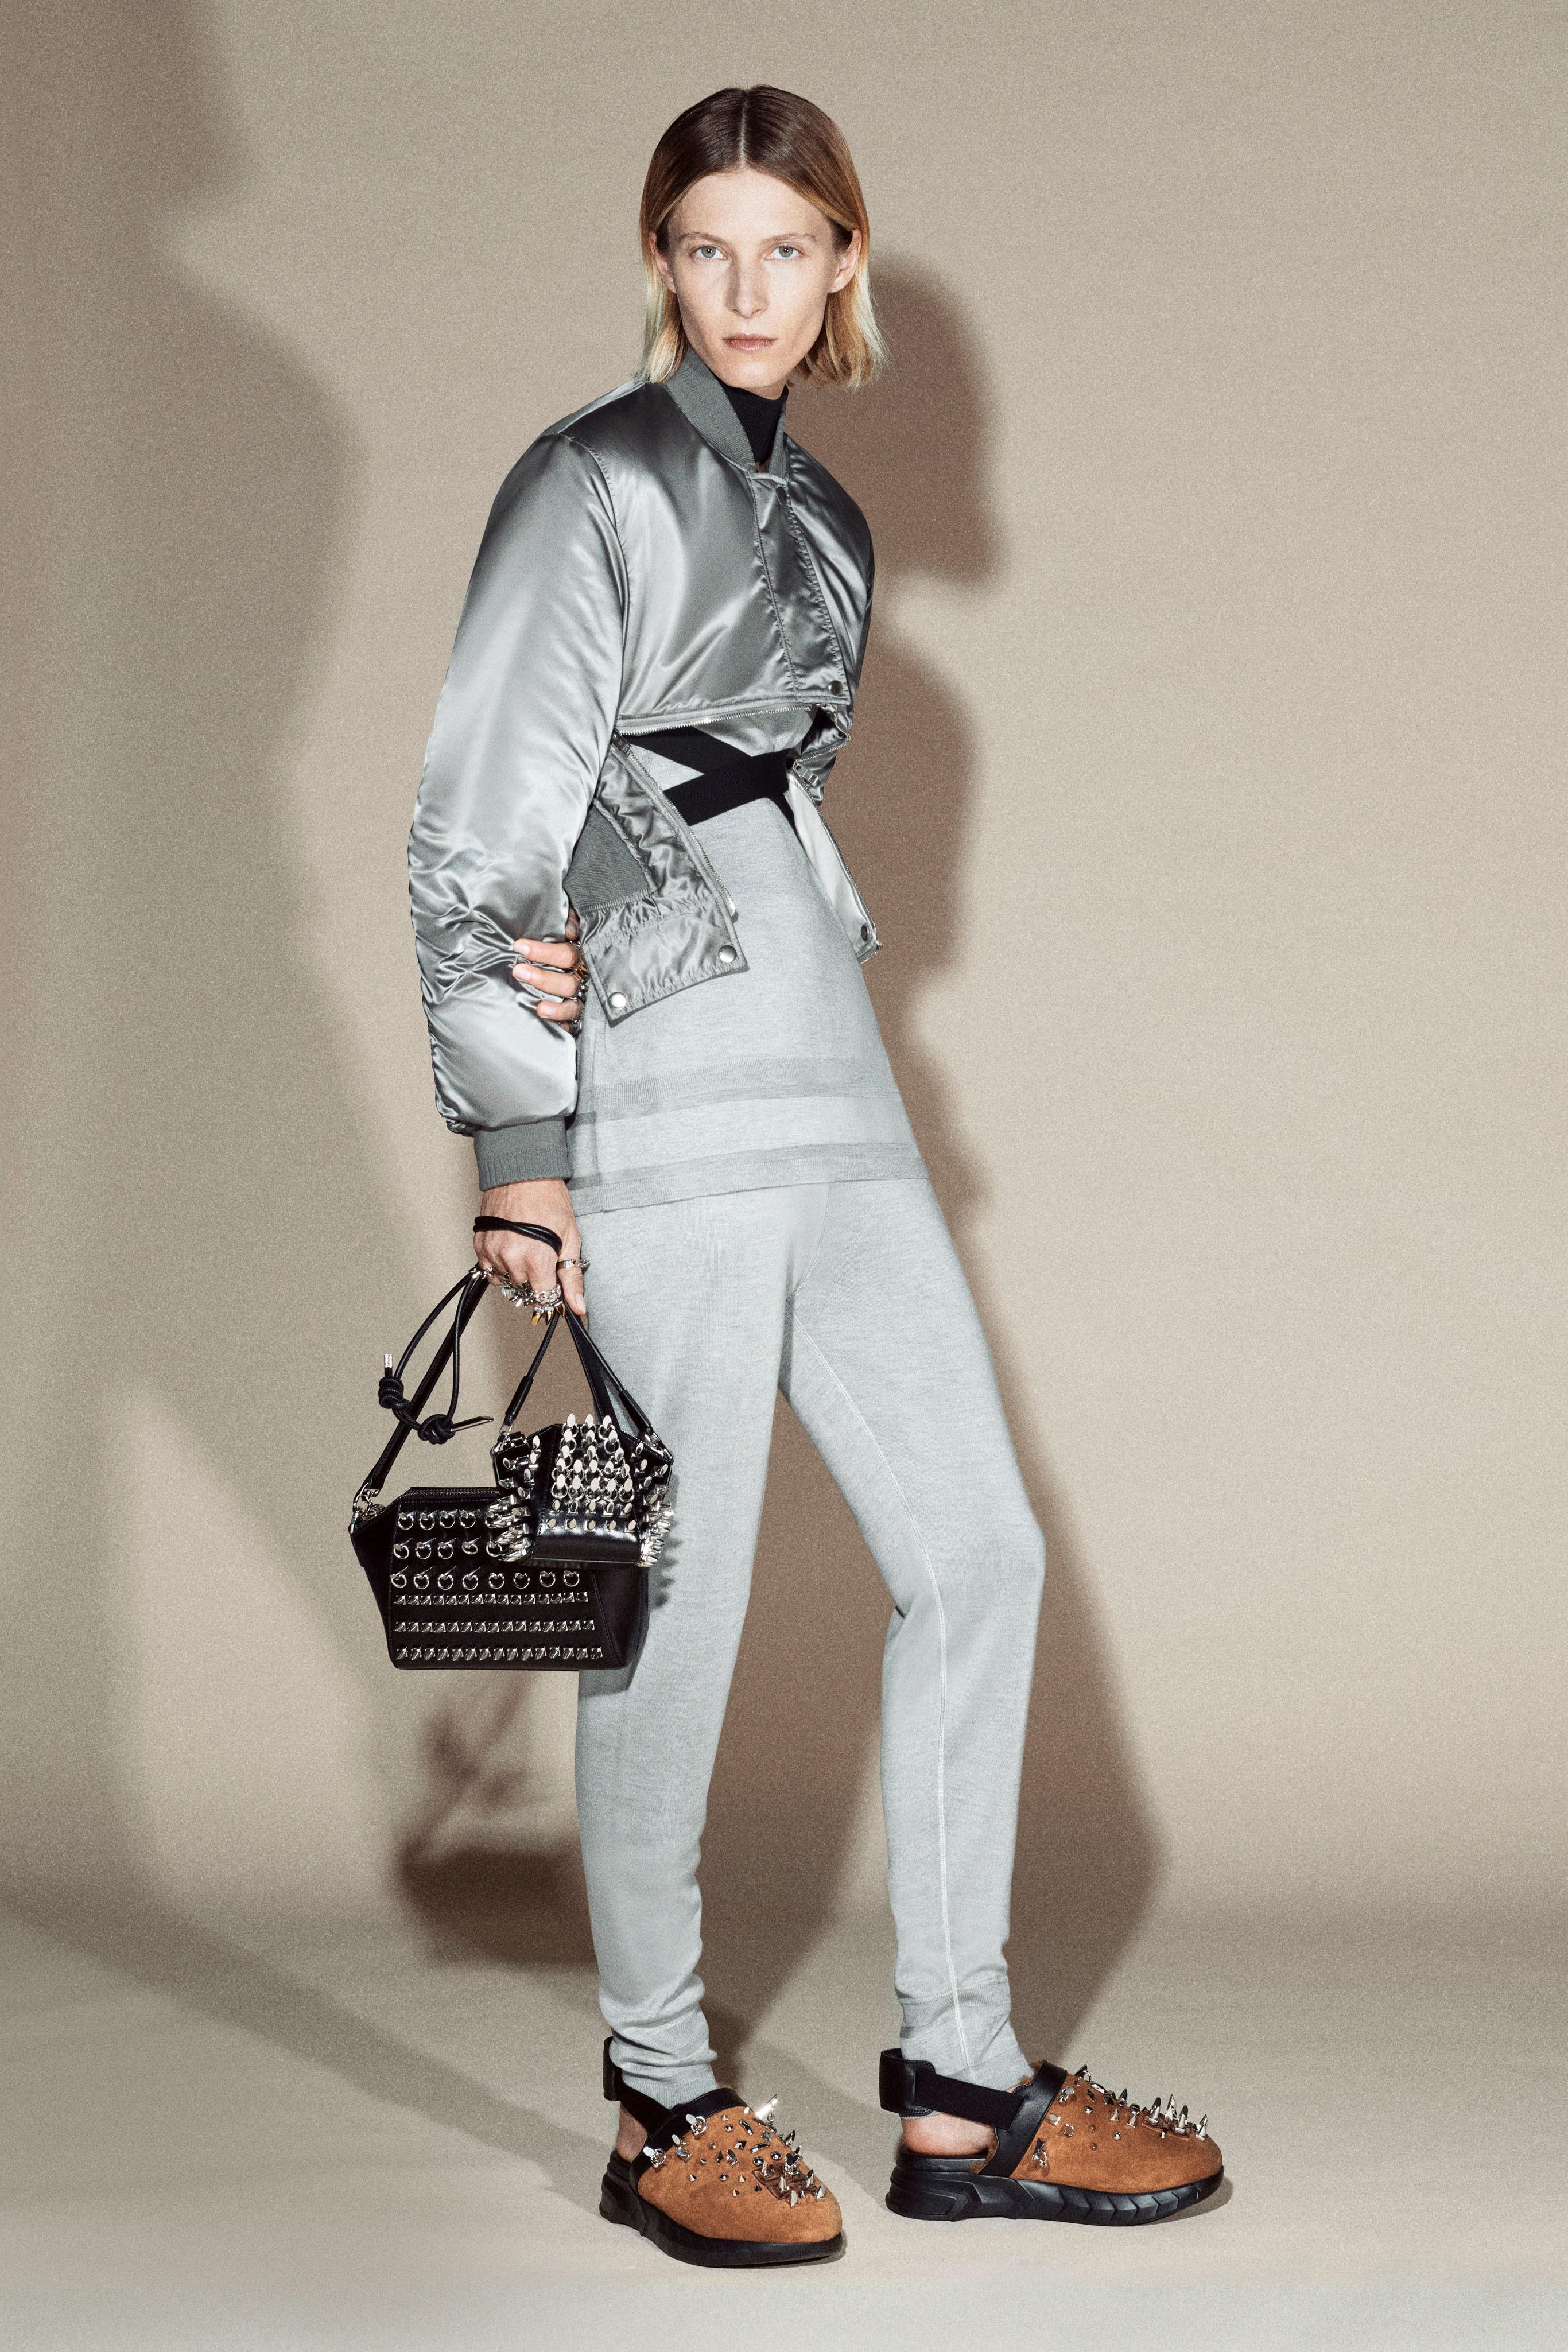 00016-Givenchy-Pre-Fall-21